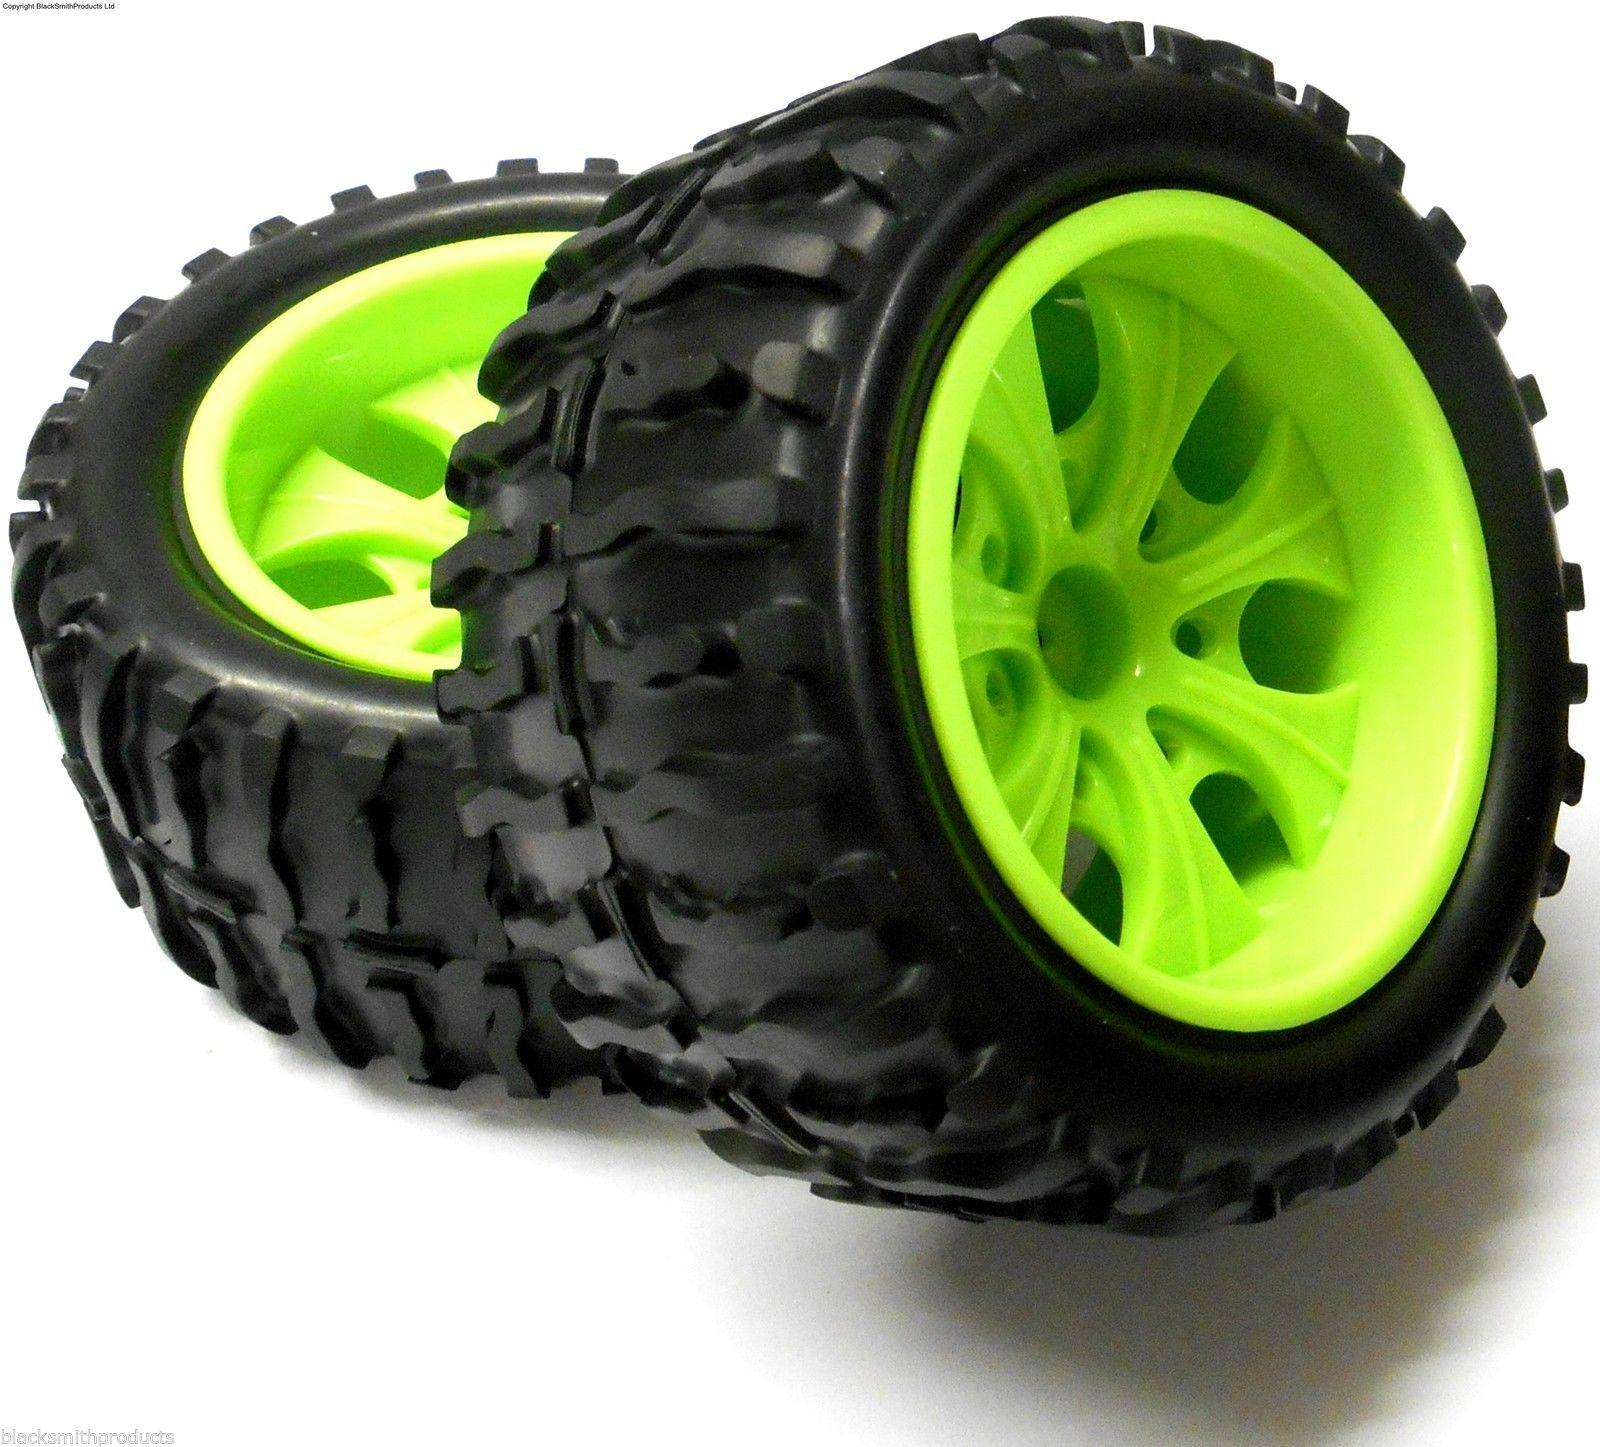 08010 Himoto 1 10 Monster Truck Tires Wheels Green